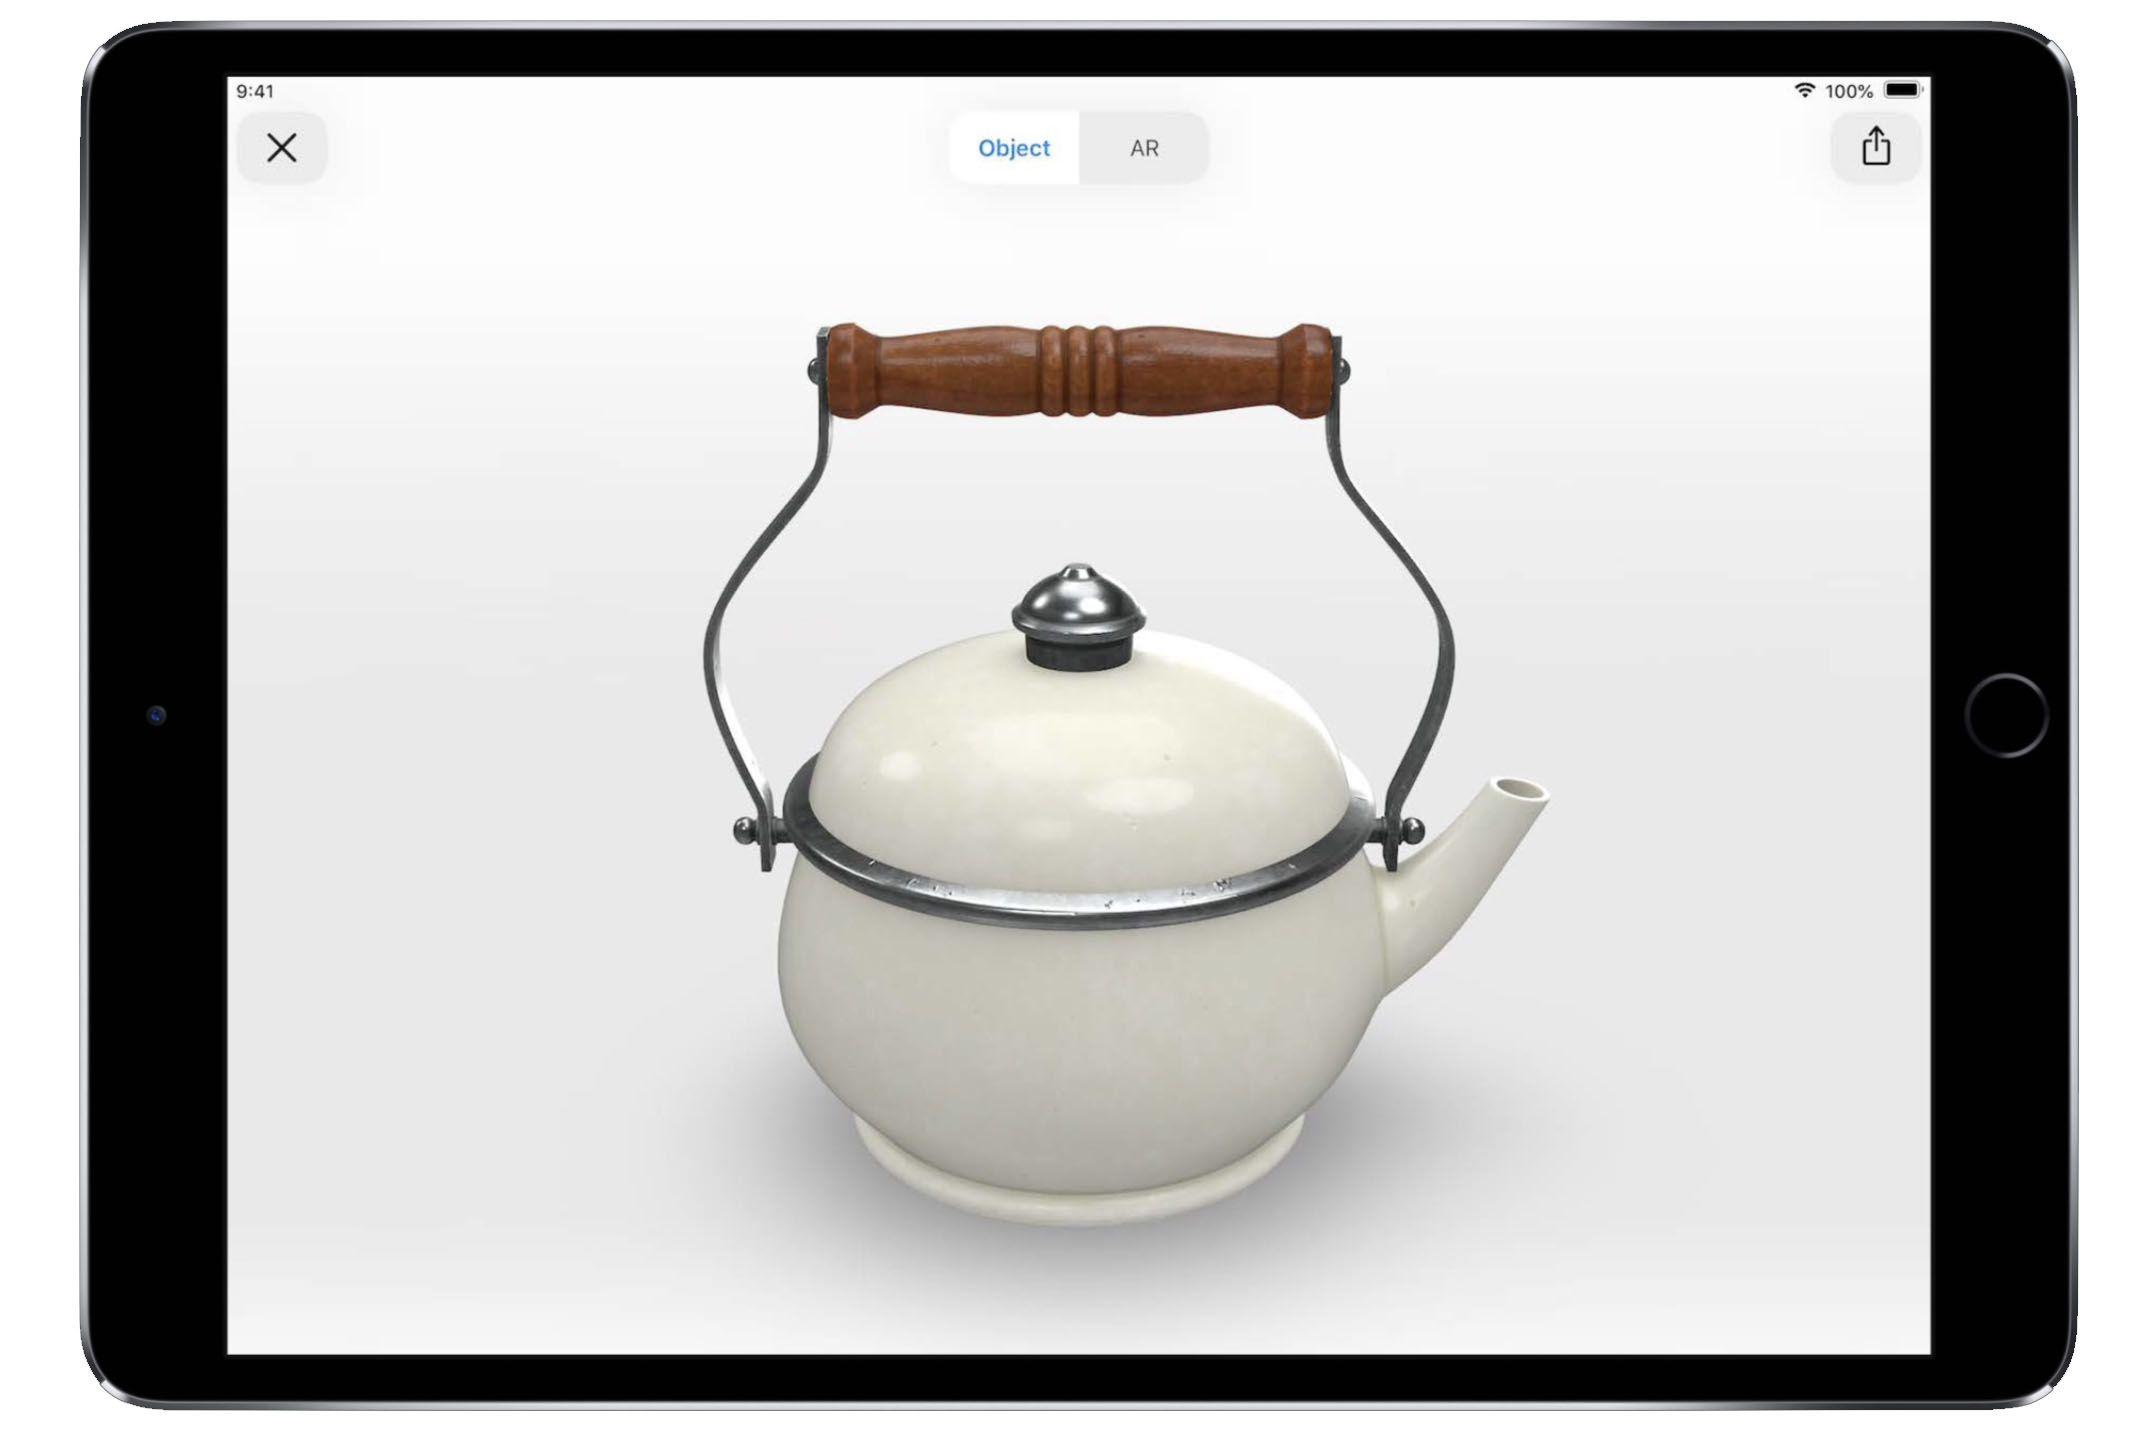 iPad showing an AR object of a teapot on an iPad